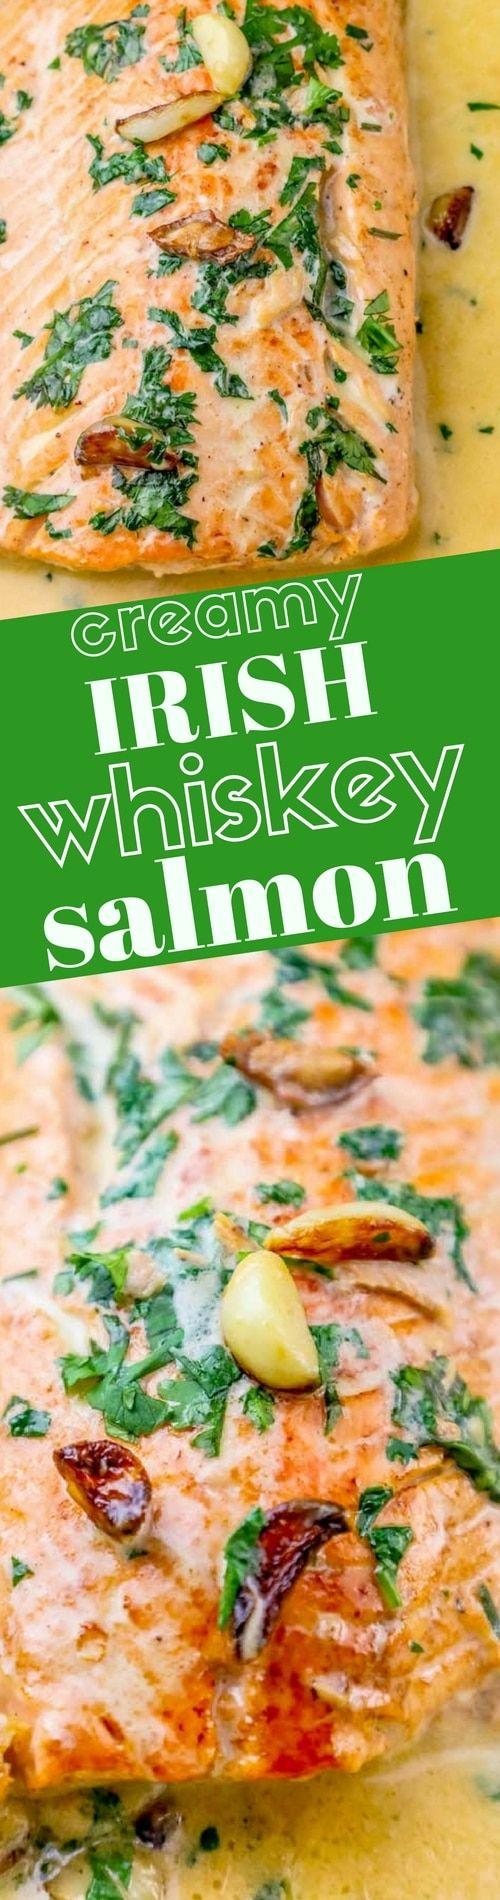 One Pot Irish Whiskey Glazed Salmon Recipe ⋆ Sweet C's Designs